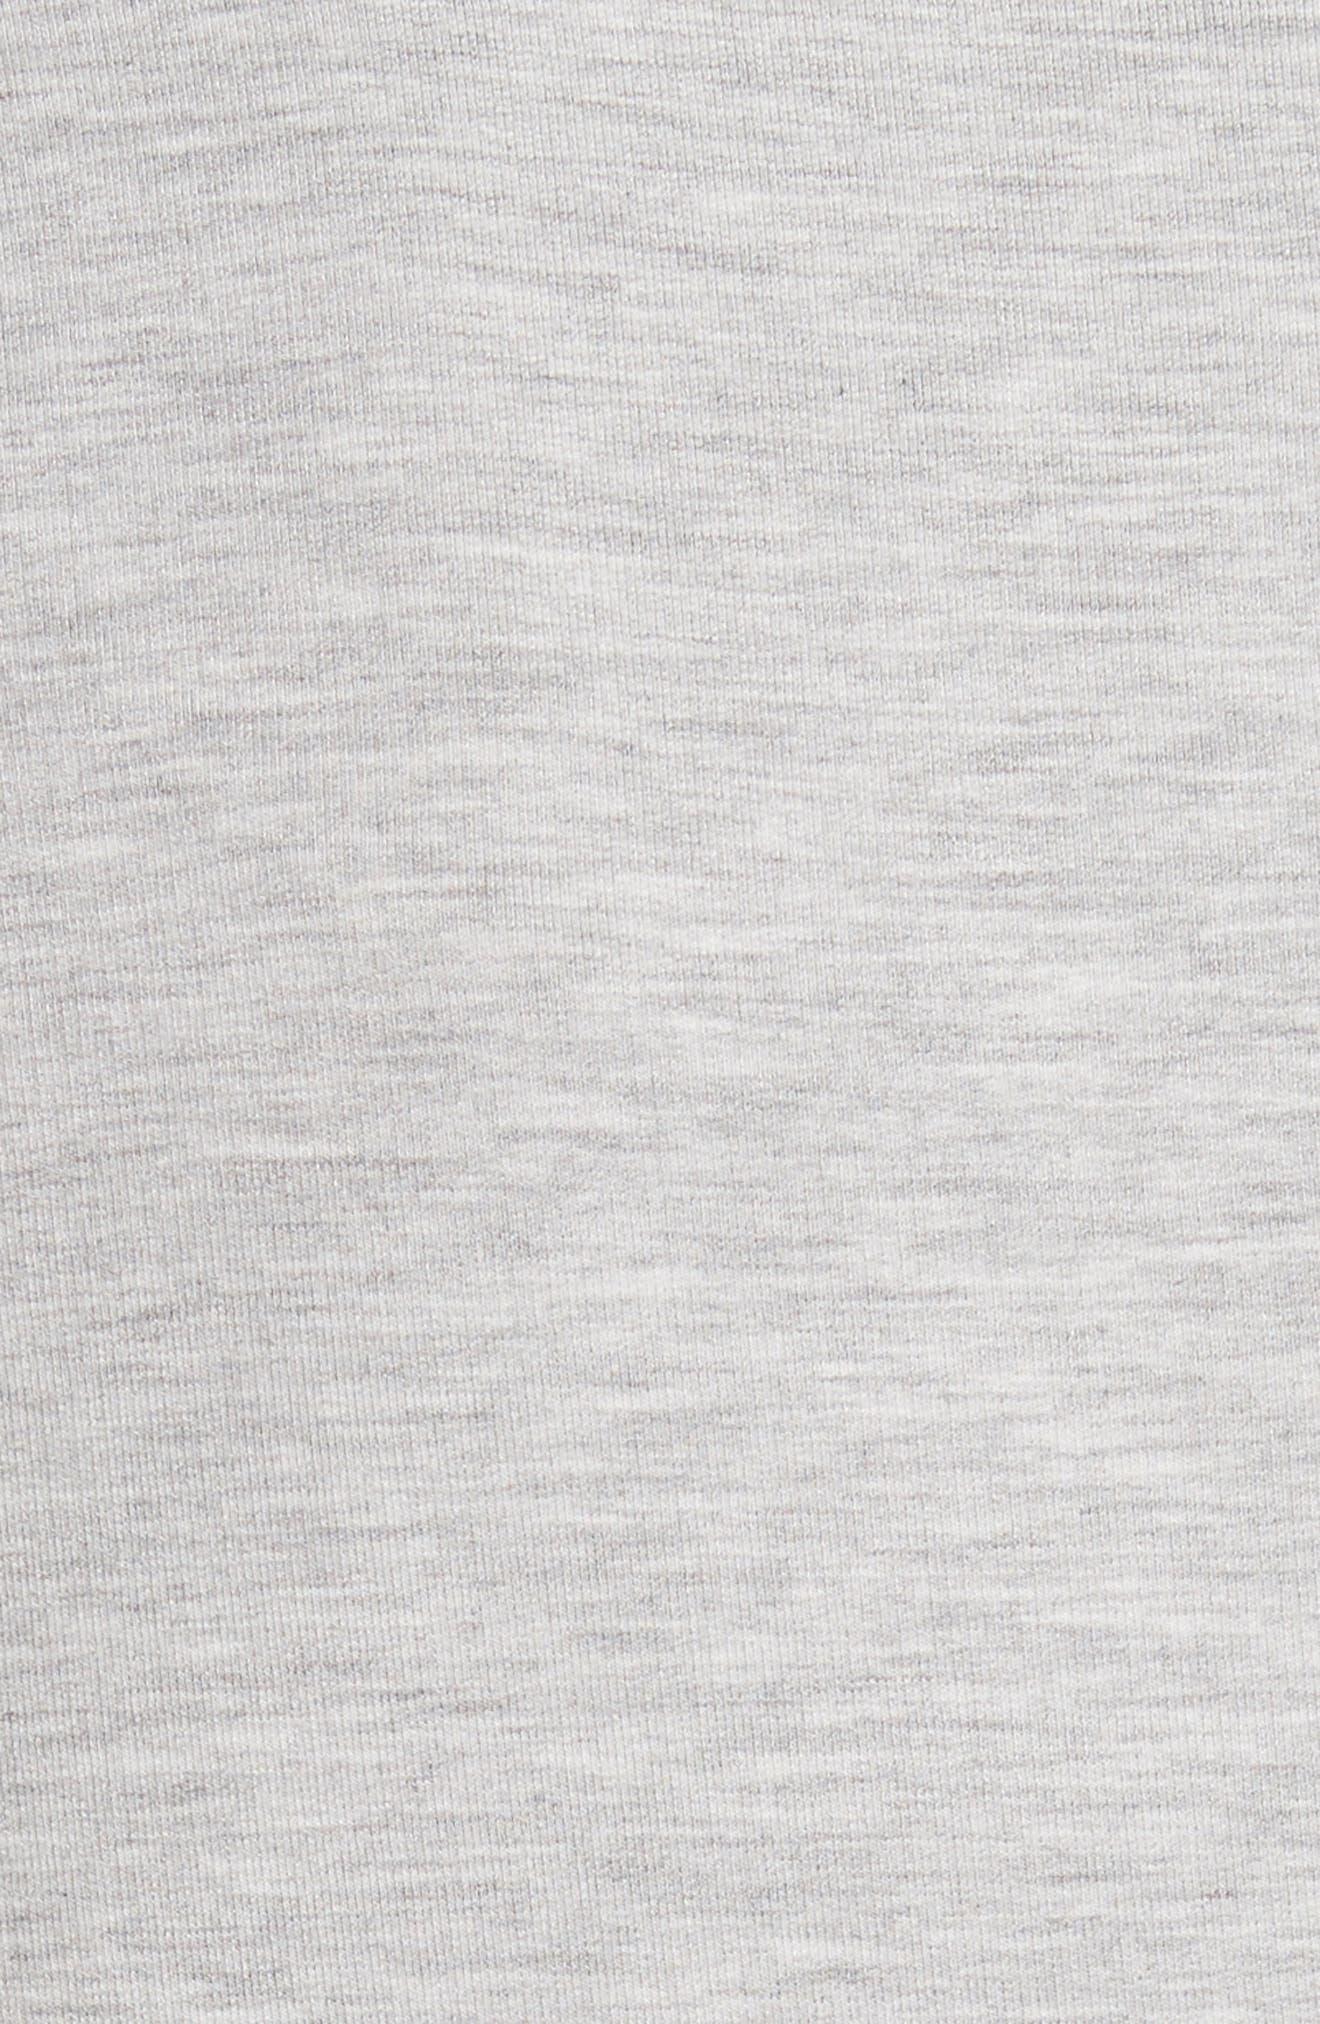 French Terry Pocket Blazer,                             Alternate thumbnail 5, color,                             037-Nacre Chine